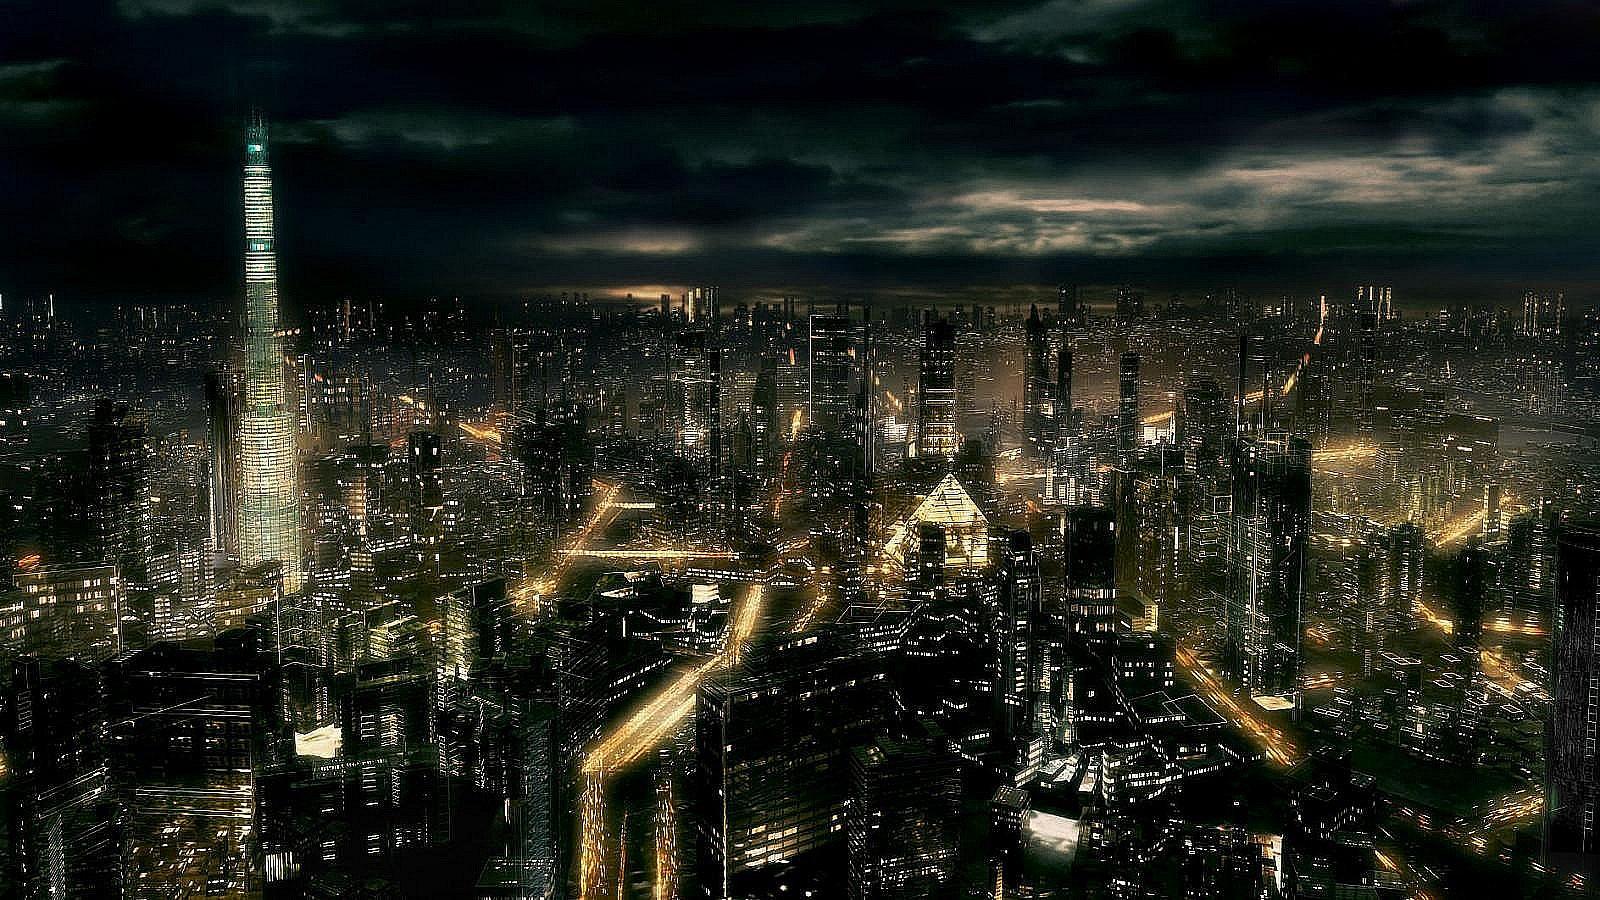 Amazing Wallpaper Night Full HD - city-night-hd-wallpaper-14  Graphic-5315.jpg